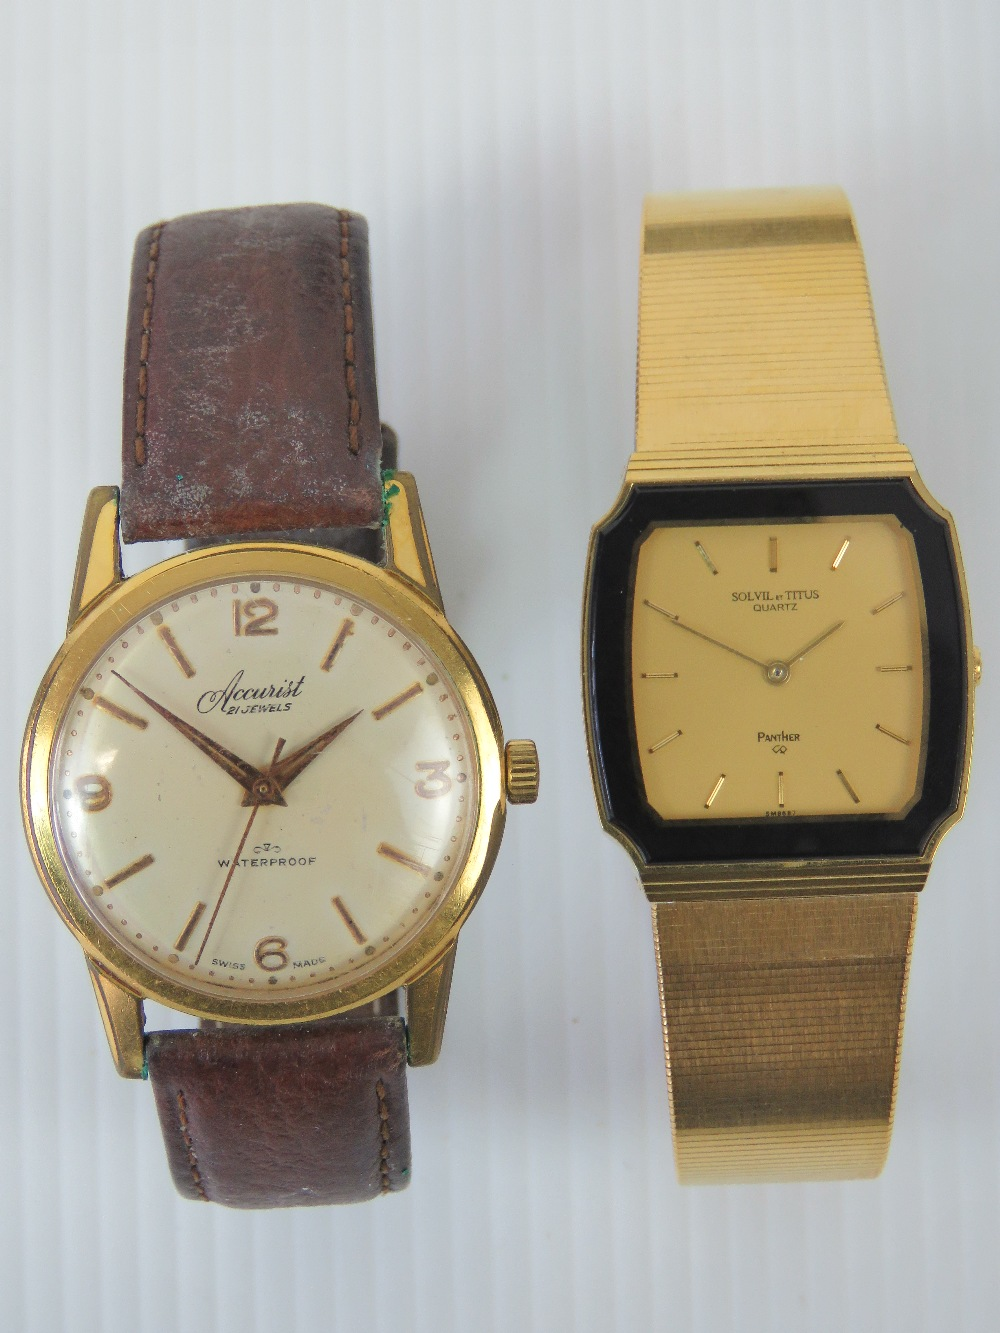 Lot 357 - A vintage Accurist manual wristwatch wit